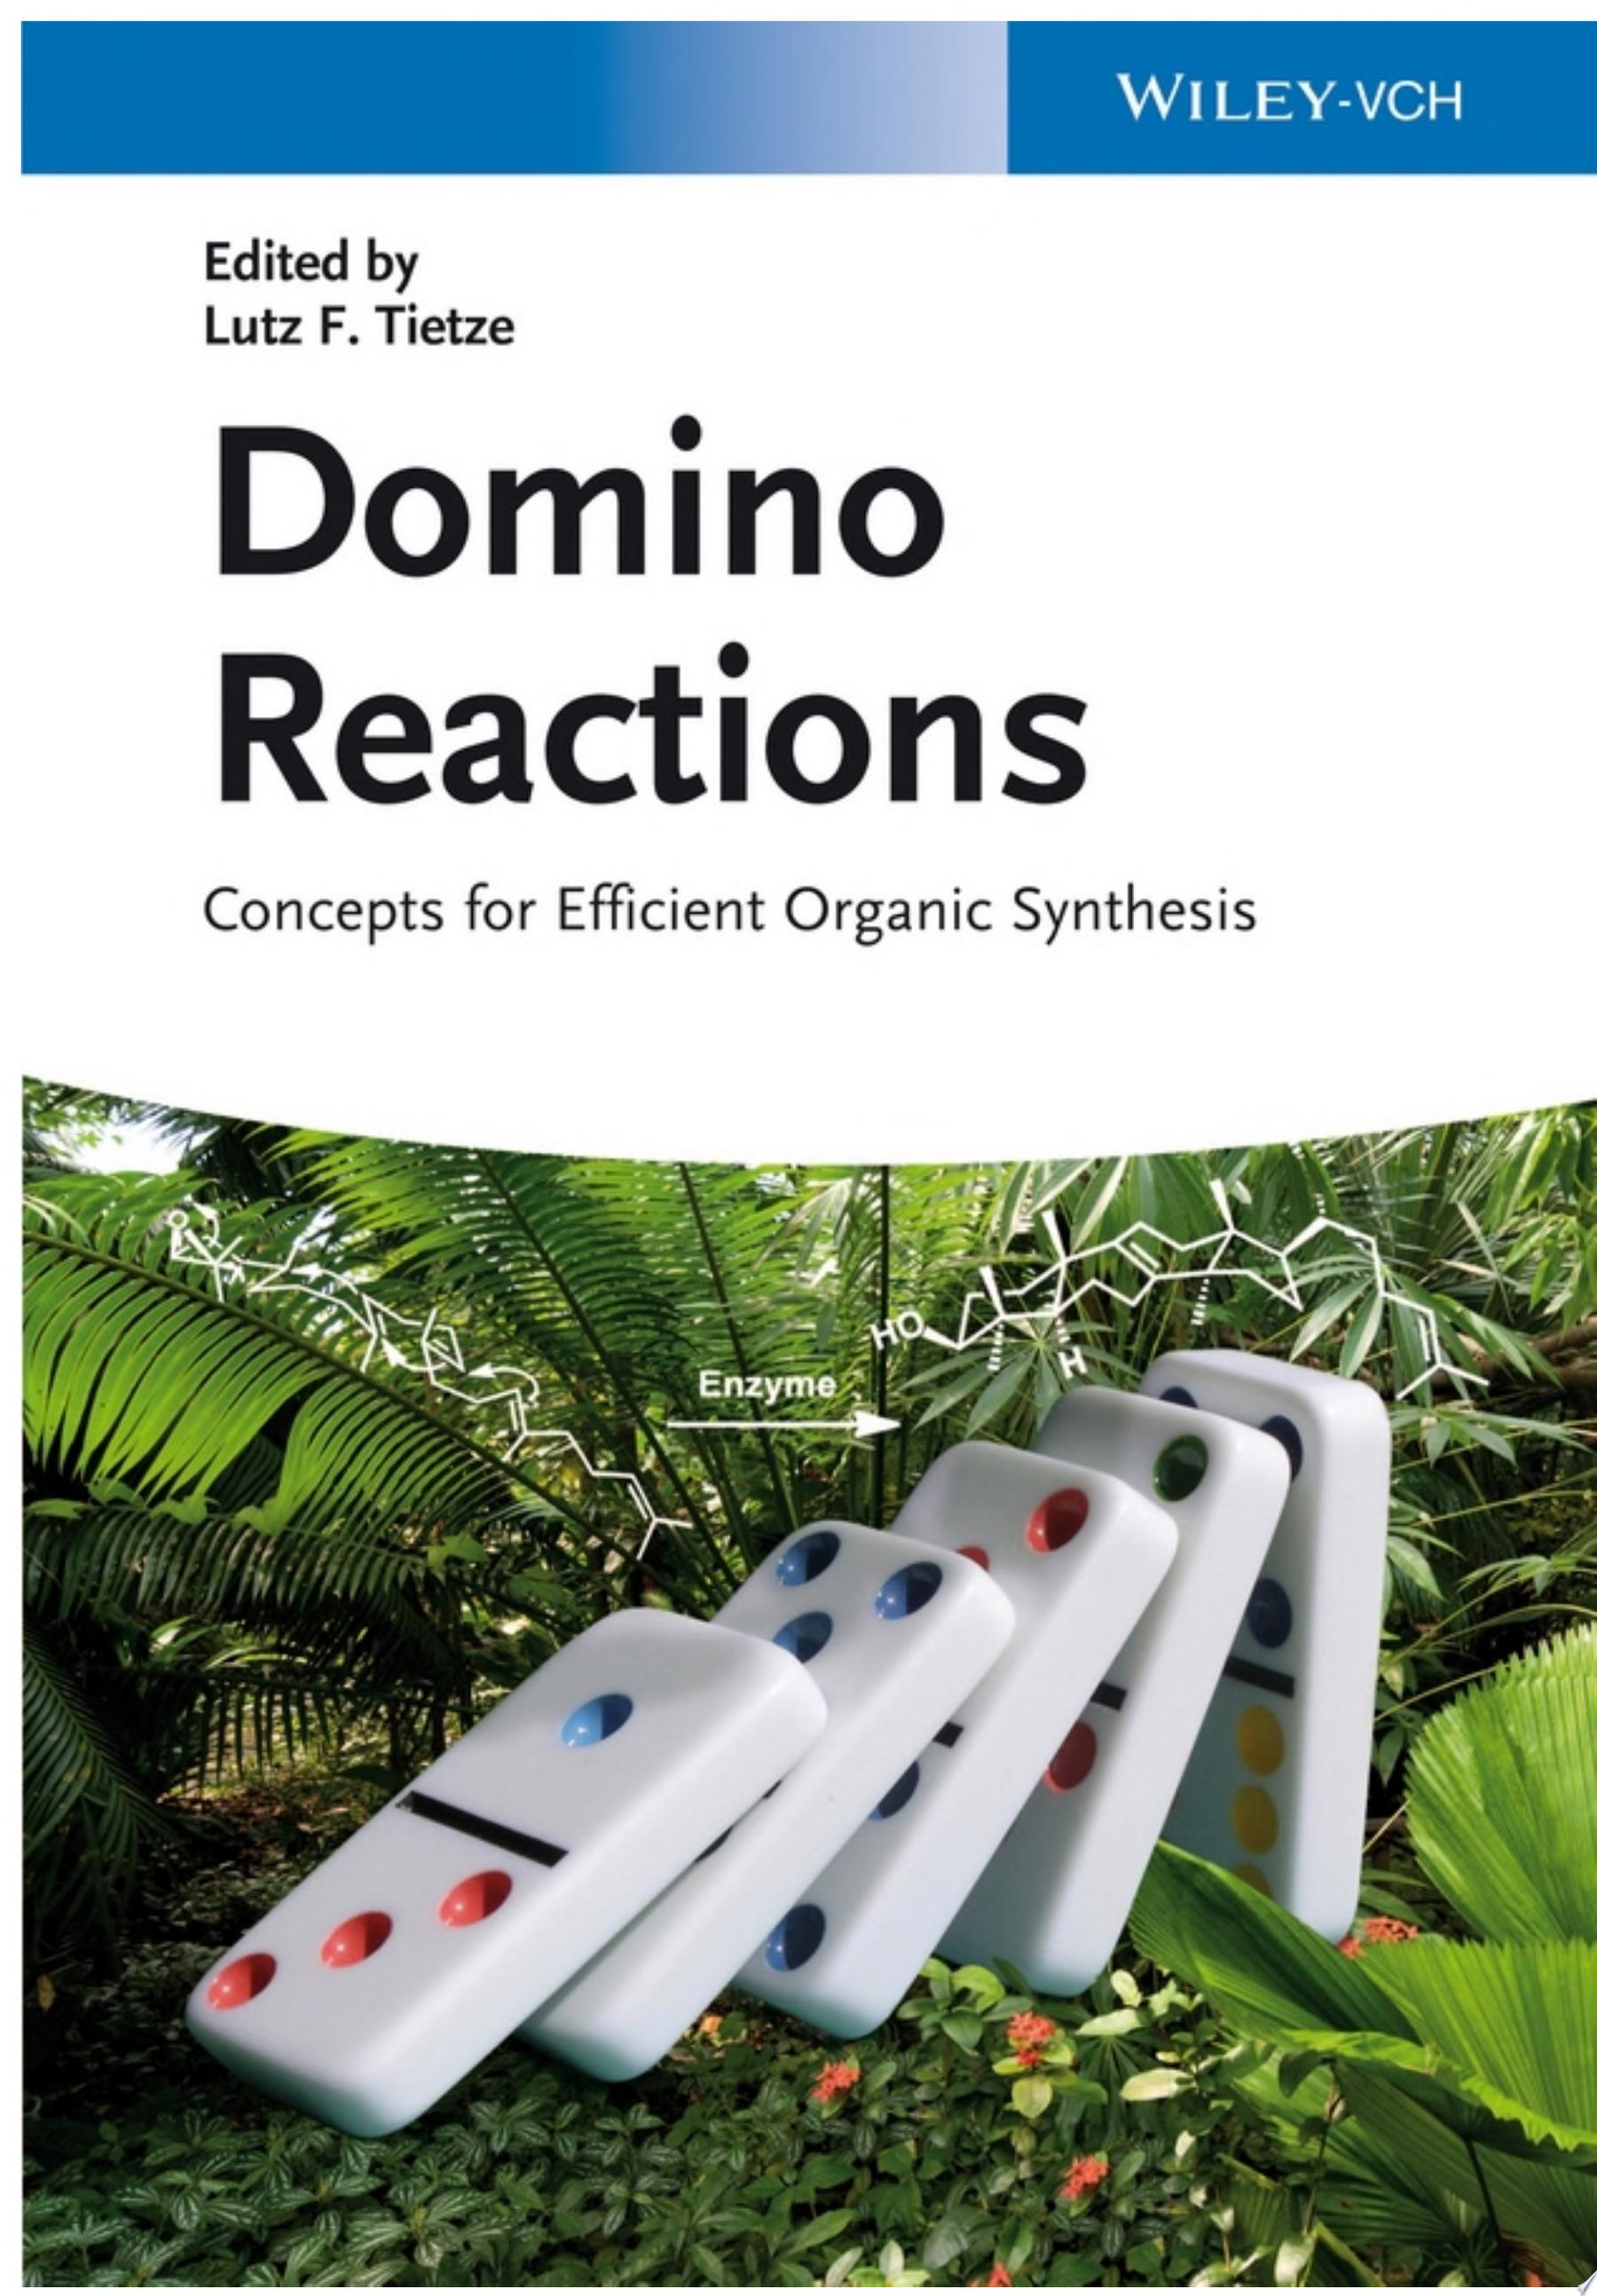 Domino Reactions